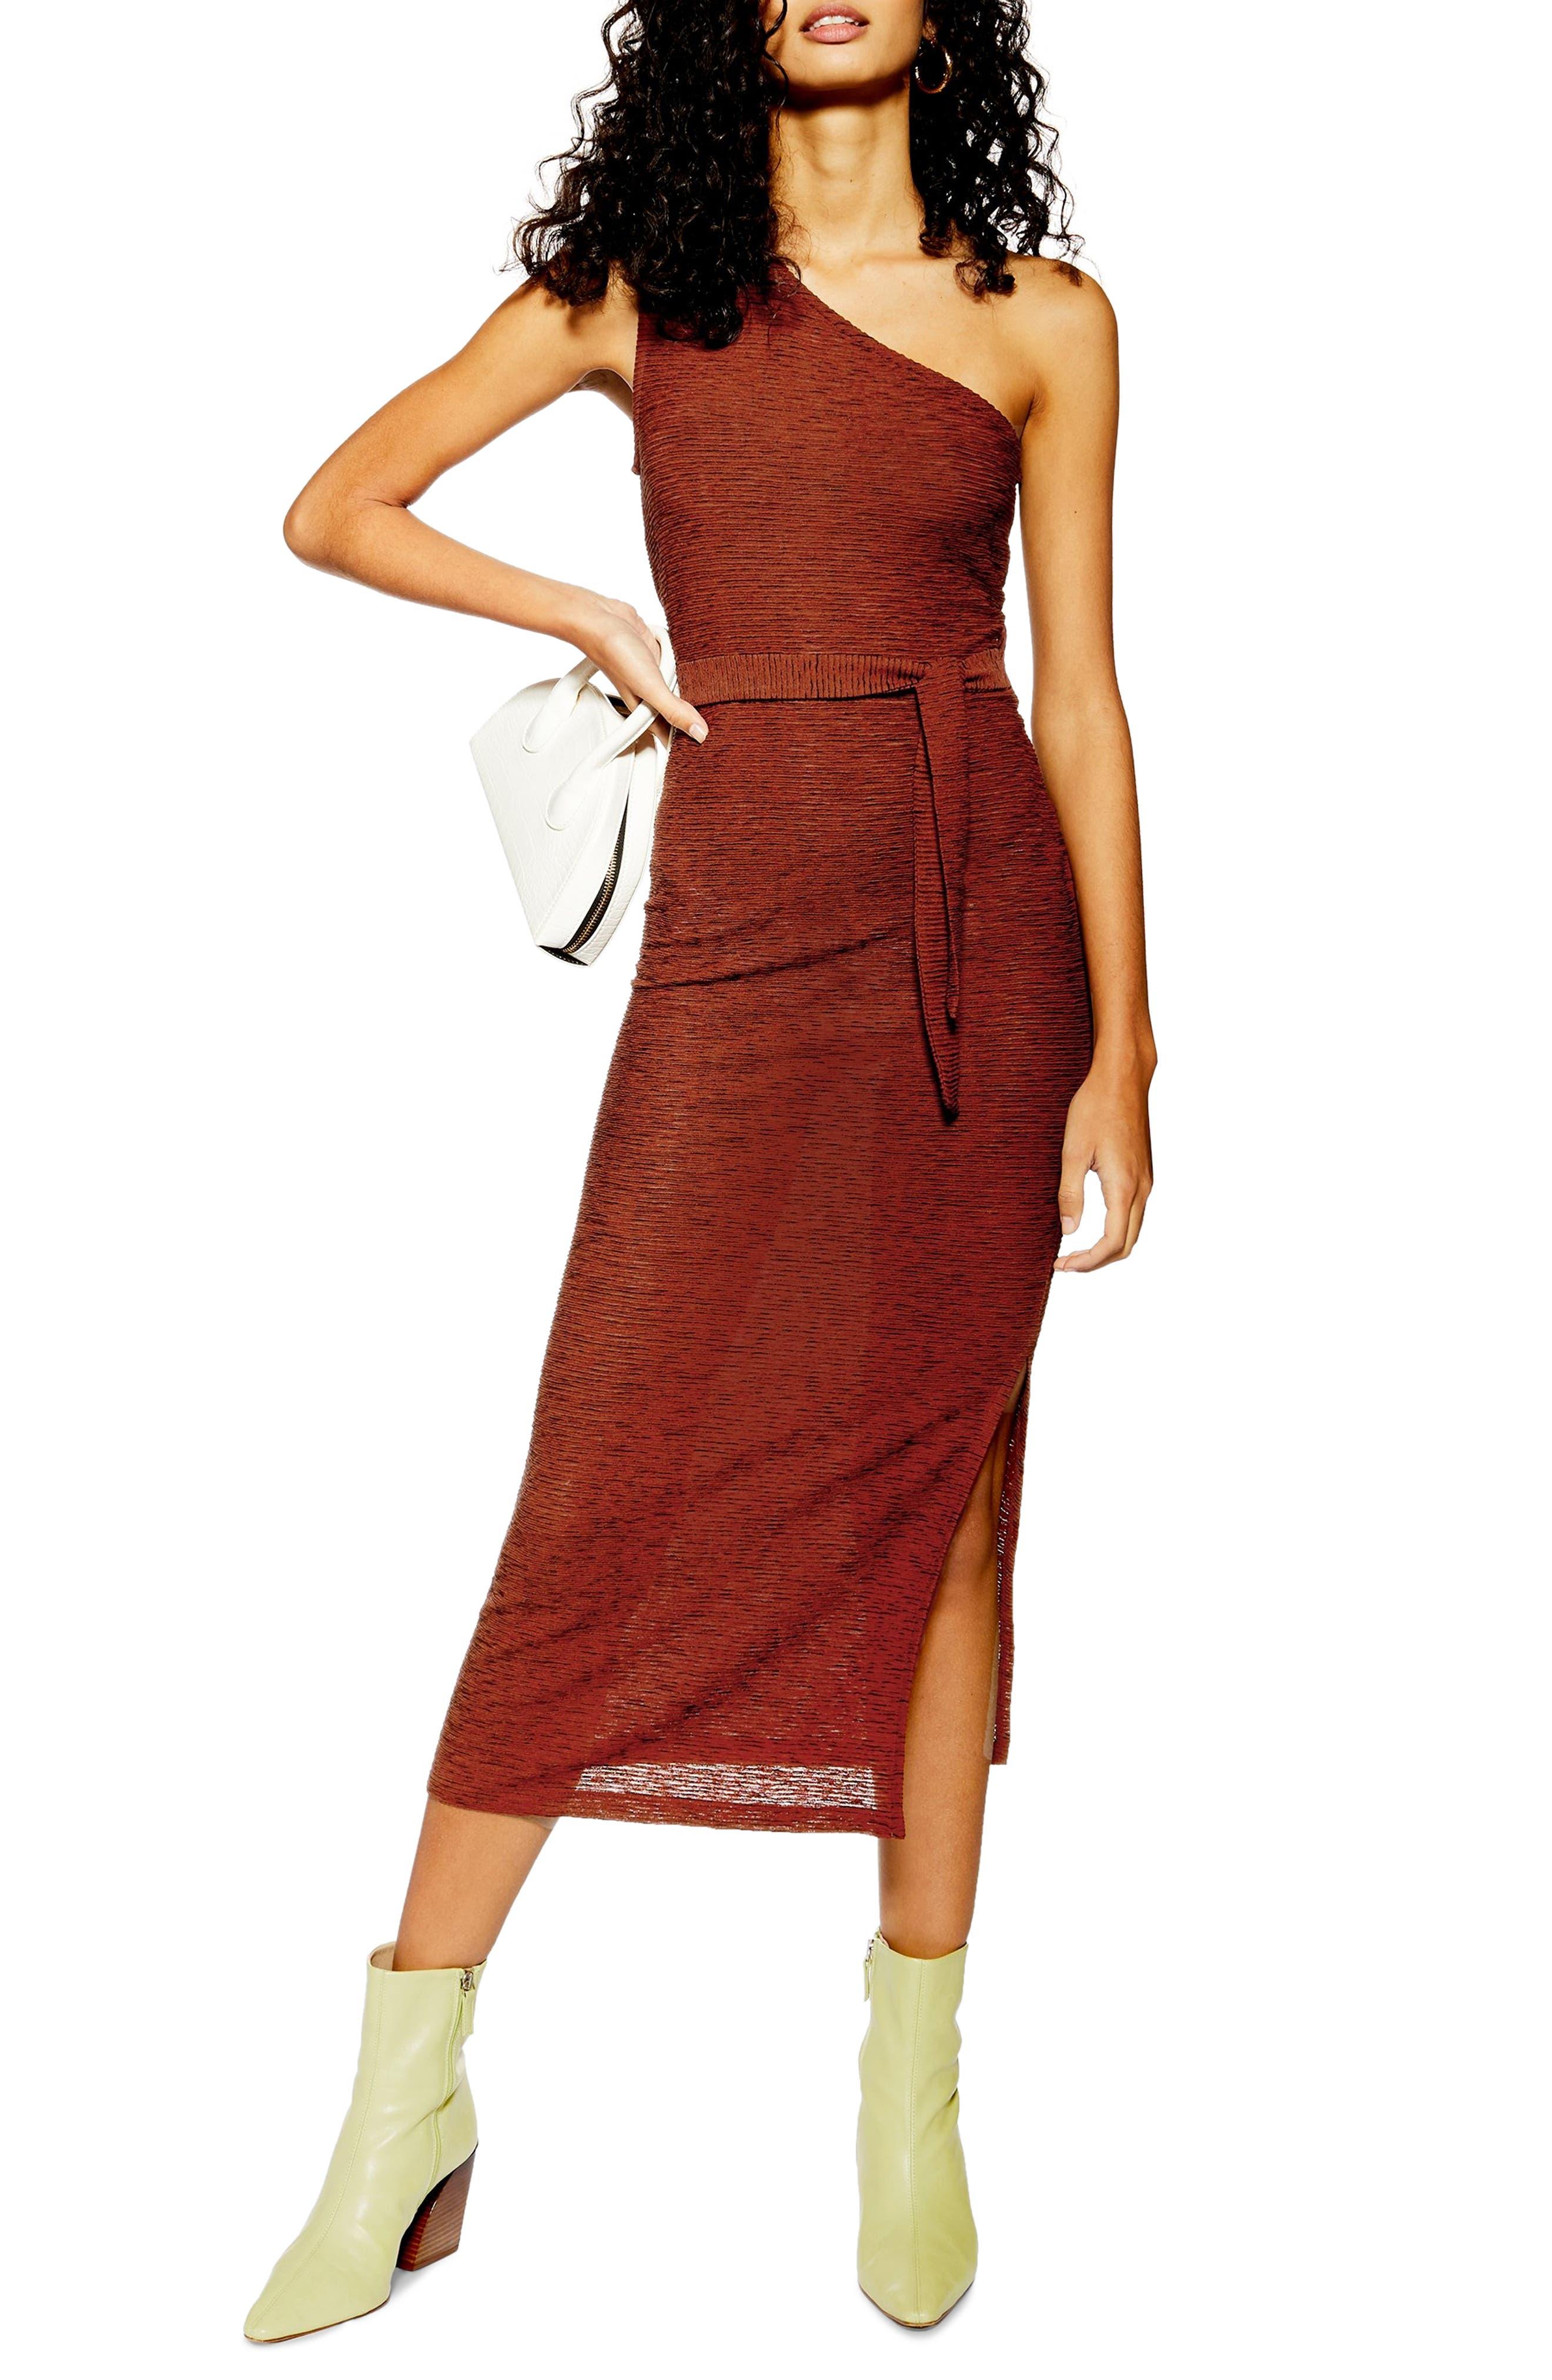 Topshop Texture Stripe One Shoulder Midi Dress, US (fits like 2-4) - Metallic